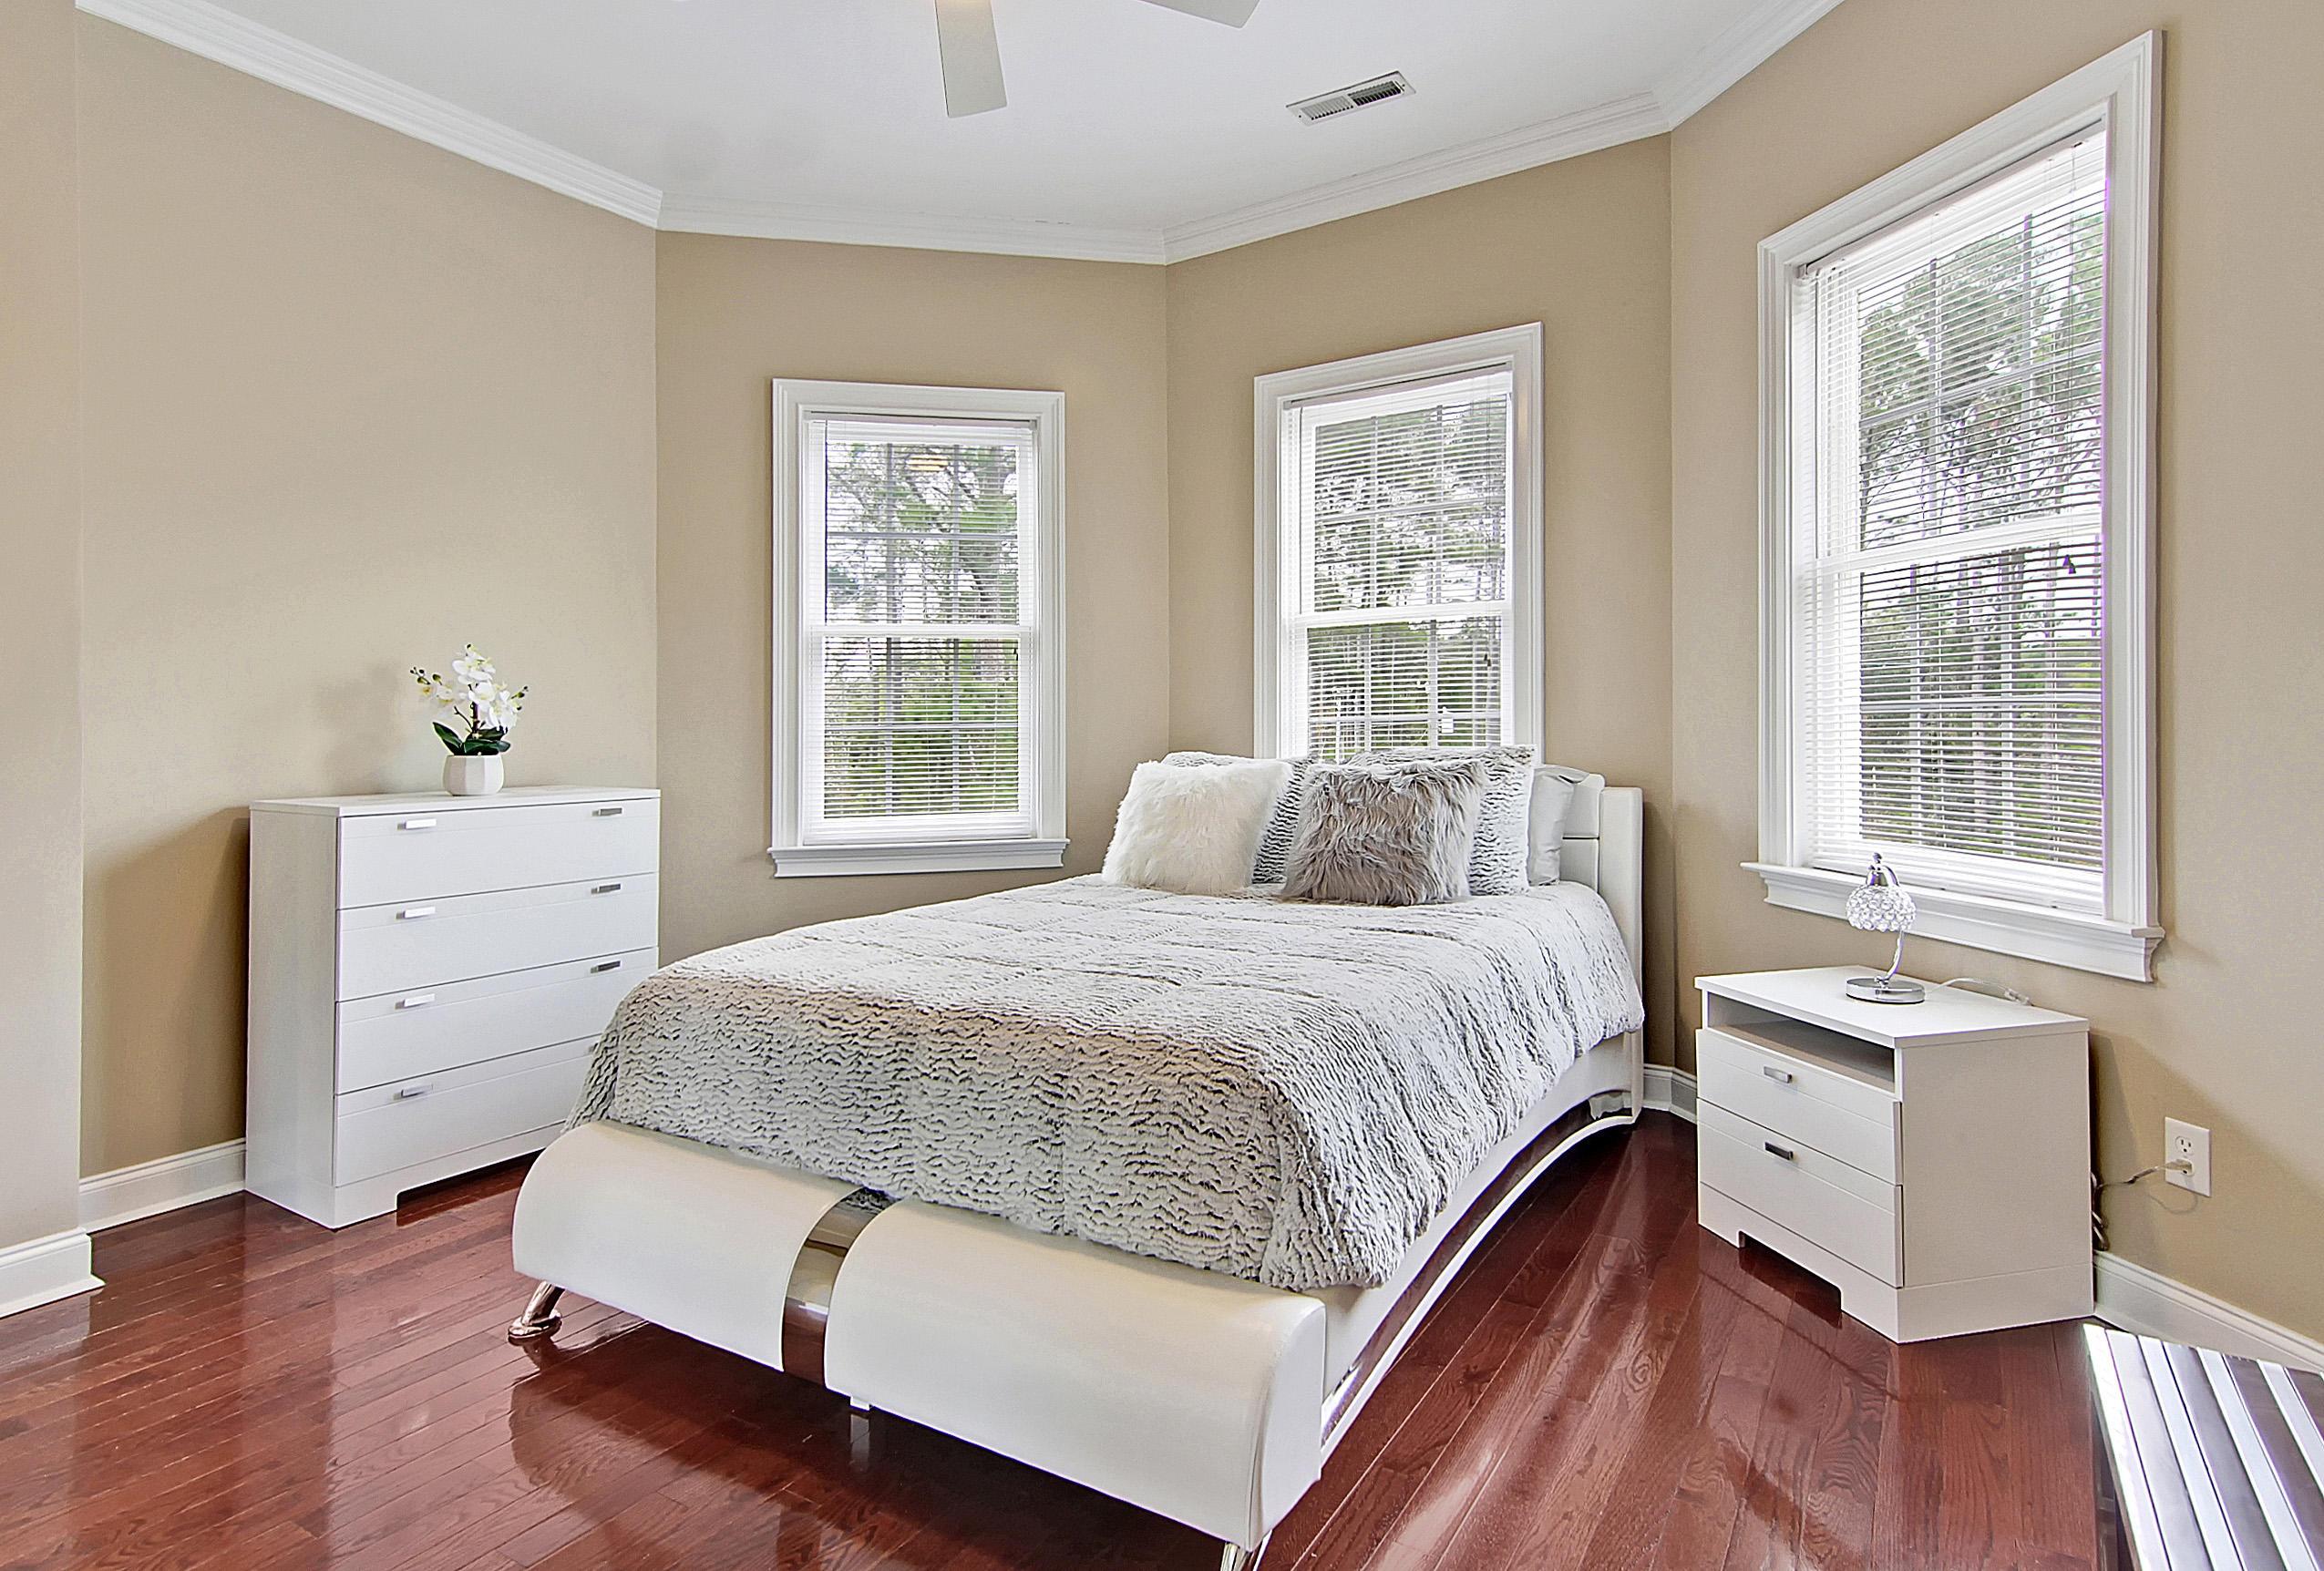 Hamlin Beach Homes For Sale - 2797 Hamlin Beach, Mount Pleasant, SC - 44